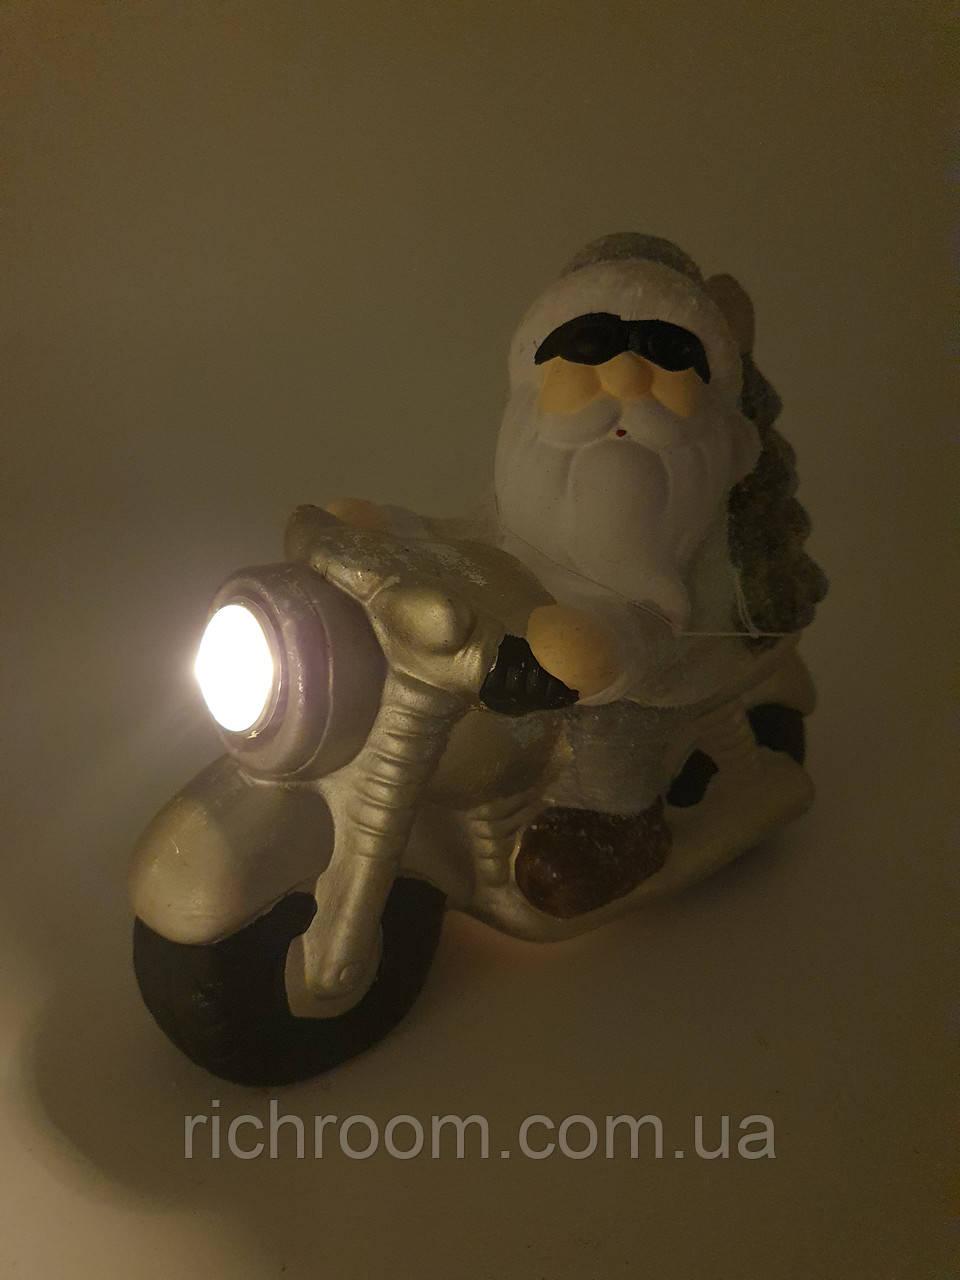 Декоративная новогодняя статуэтка Санта Клаус на мотоцикле с LED подсветкой ZD Trading